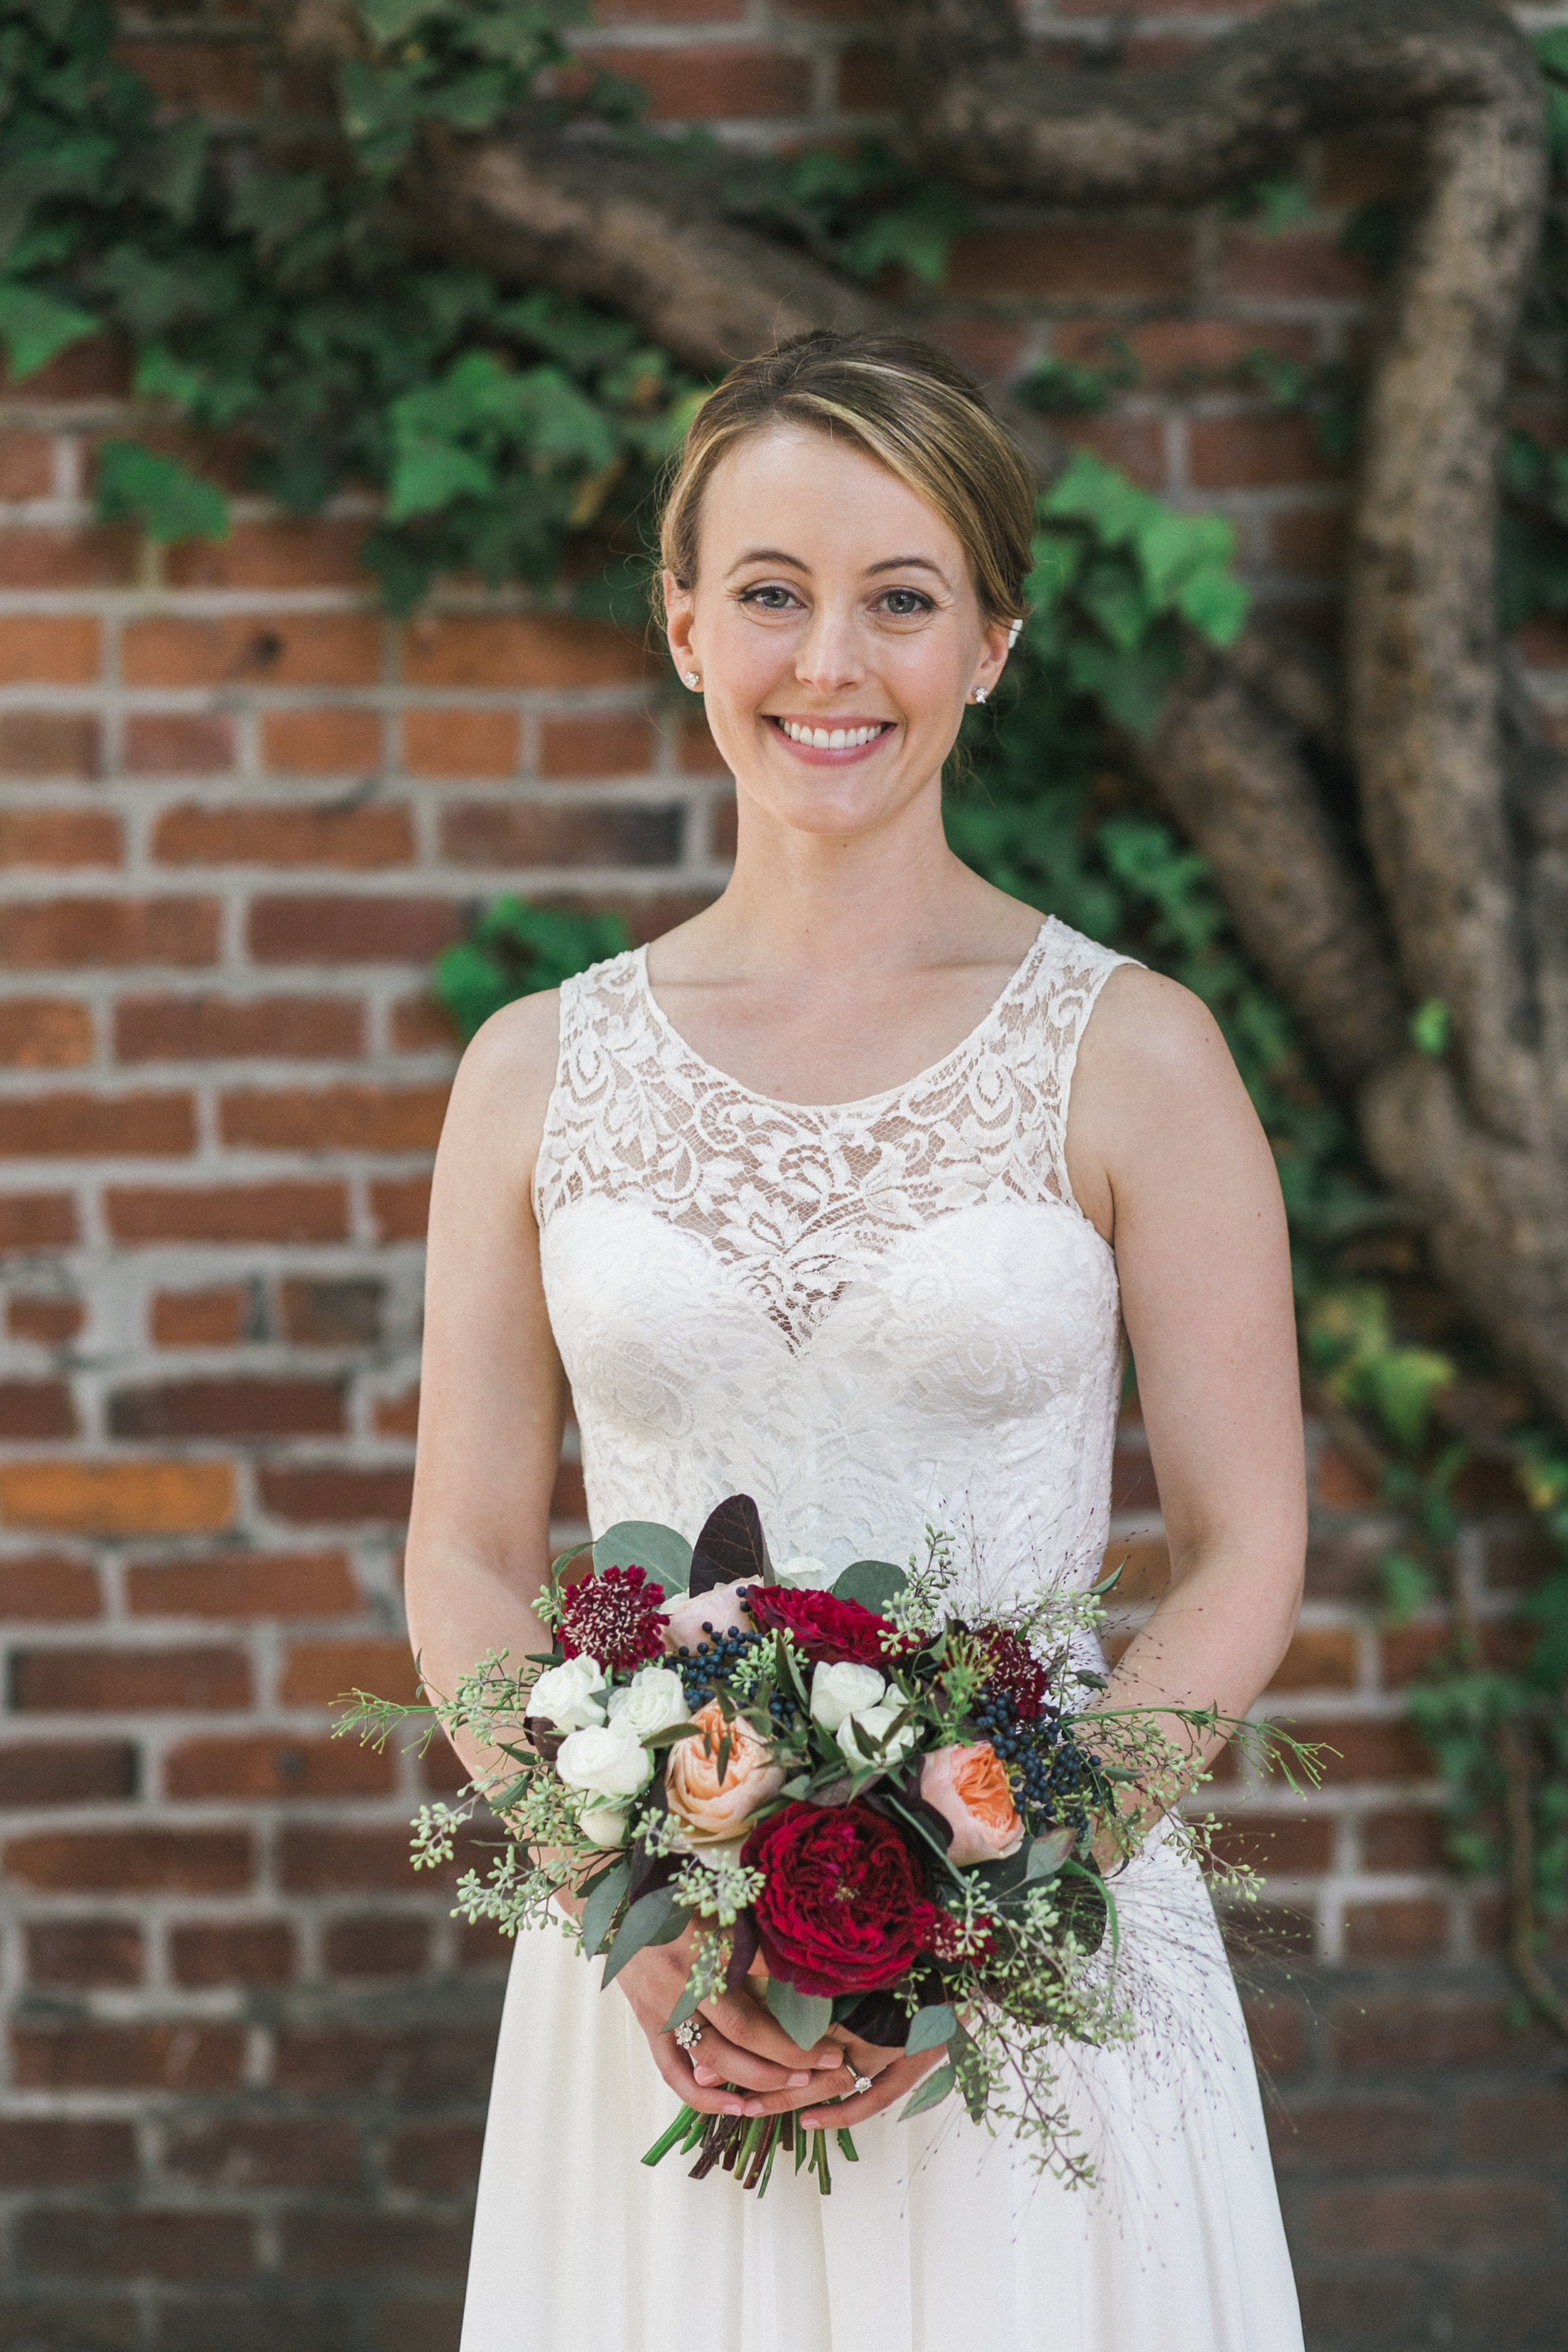 20150802_Amy+Oren_Wedding-217.jpg